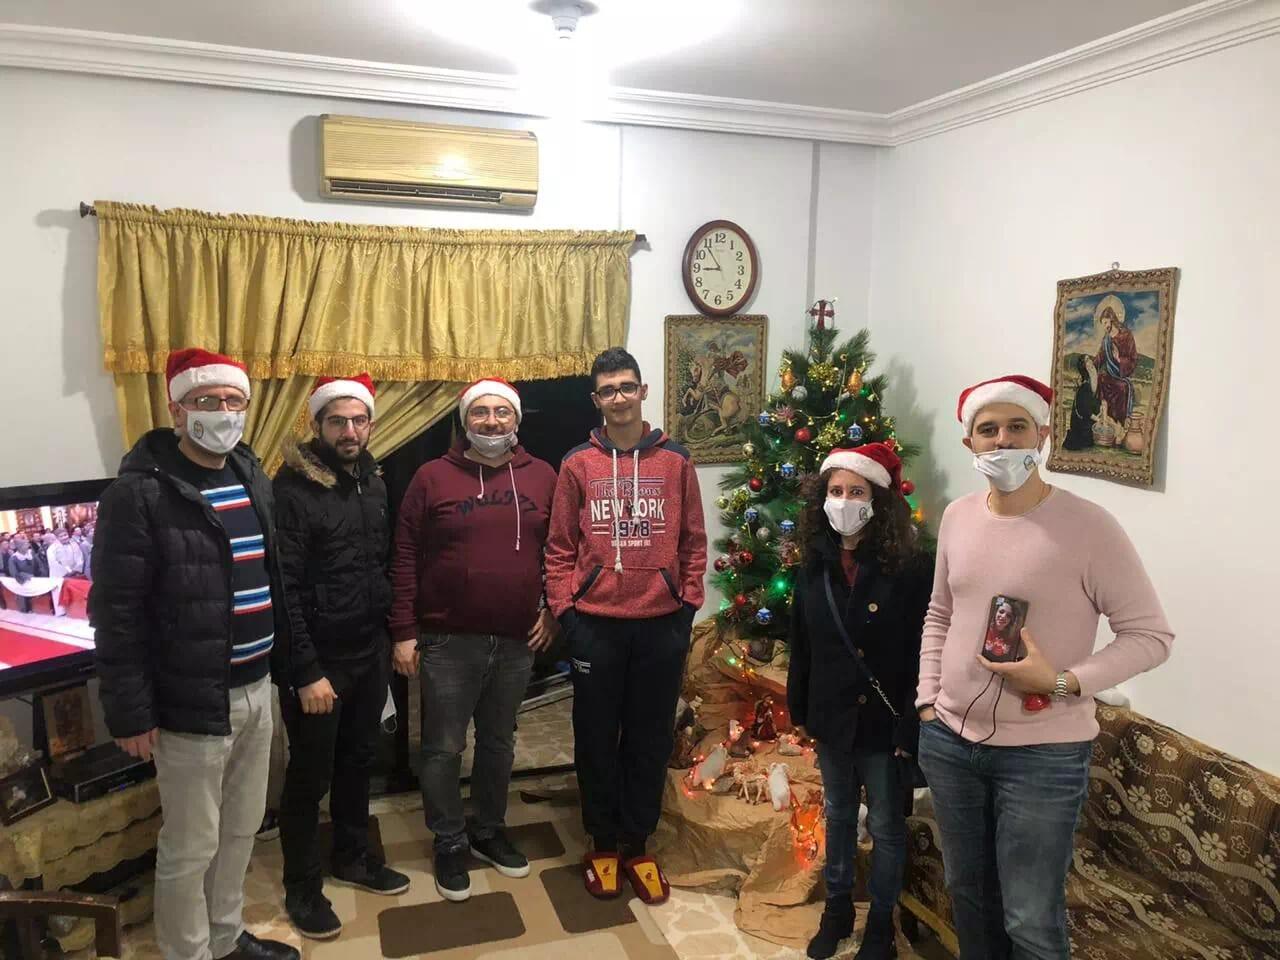 https://eundemia.sirv.com/Images/christmas/456932.webp